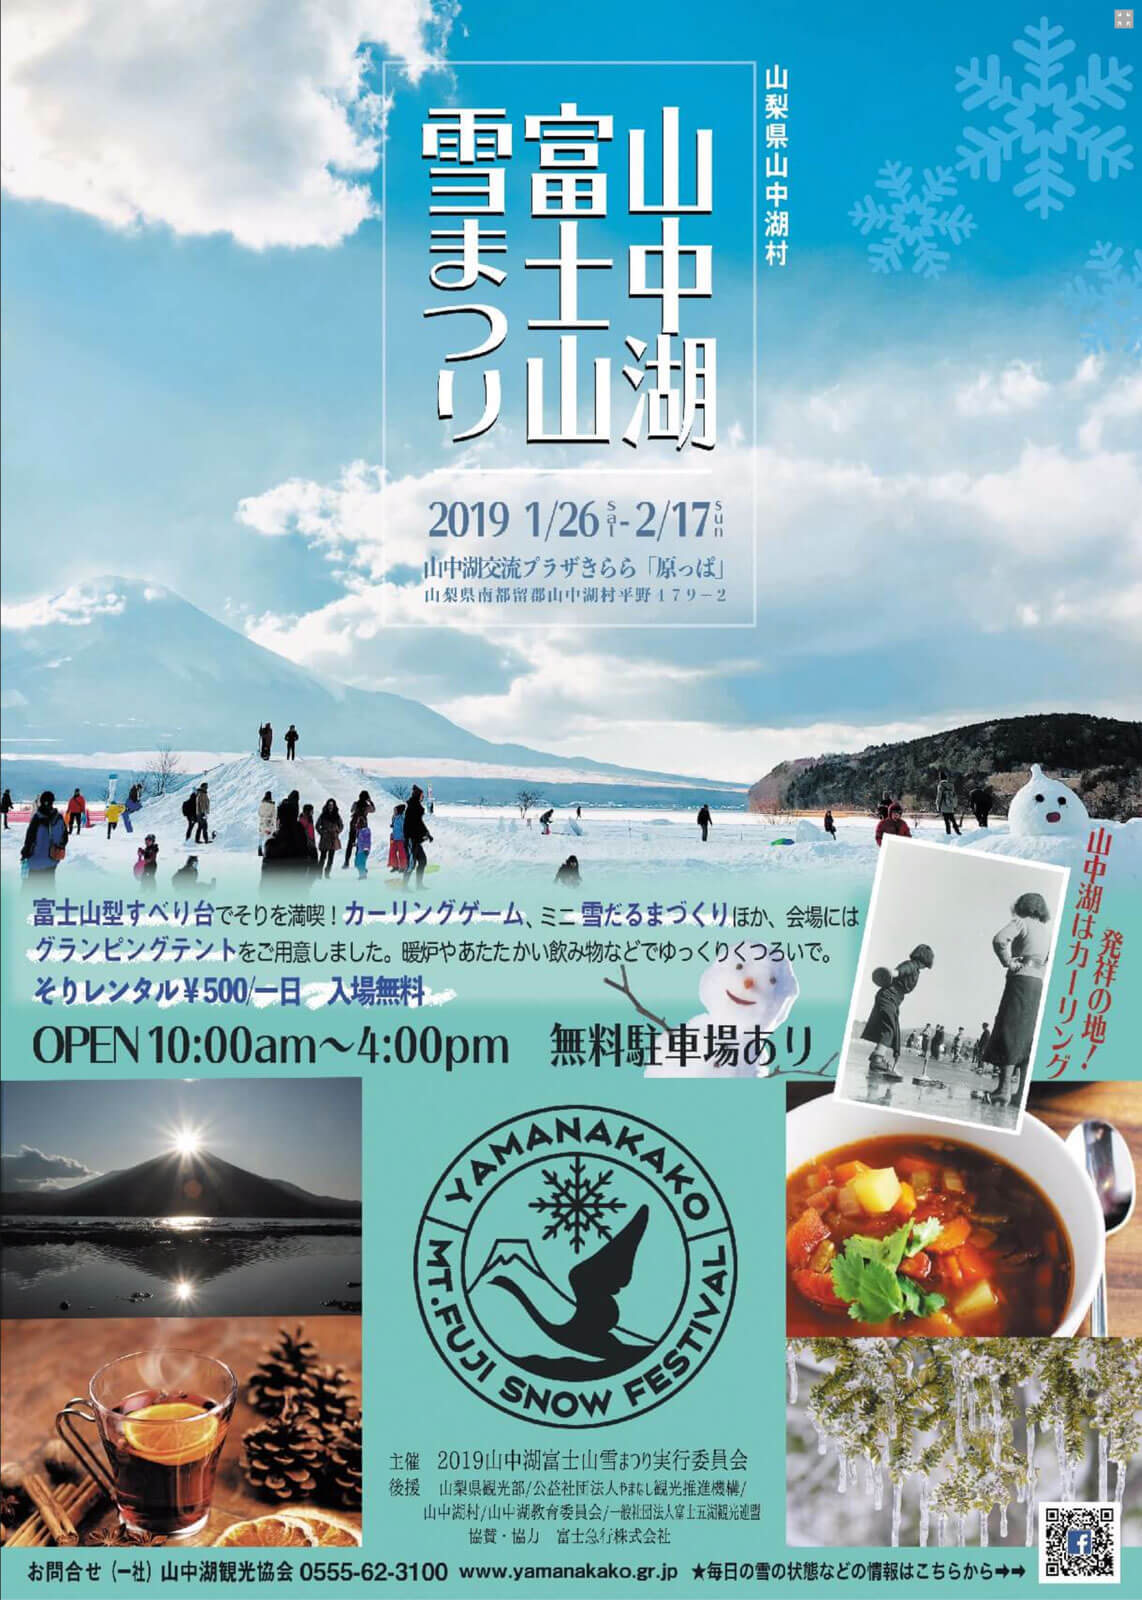 Yamanakako Mt Fuji Snow Festival 3776D